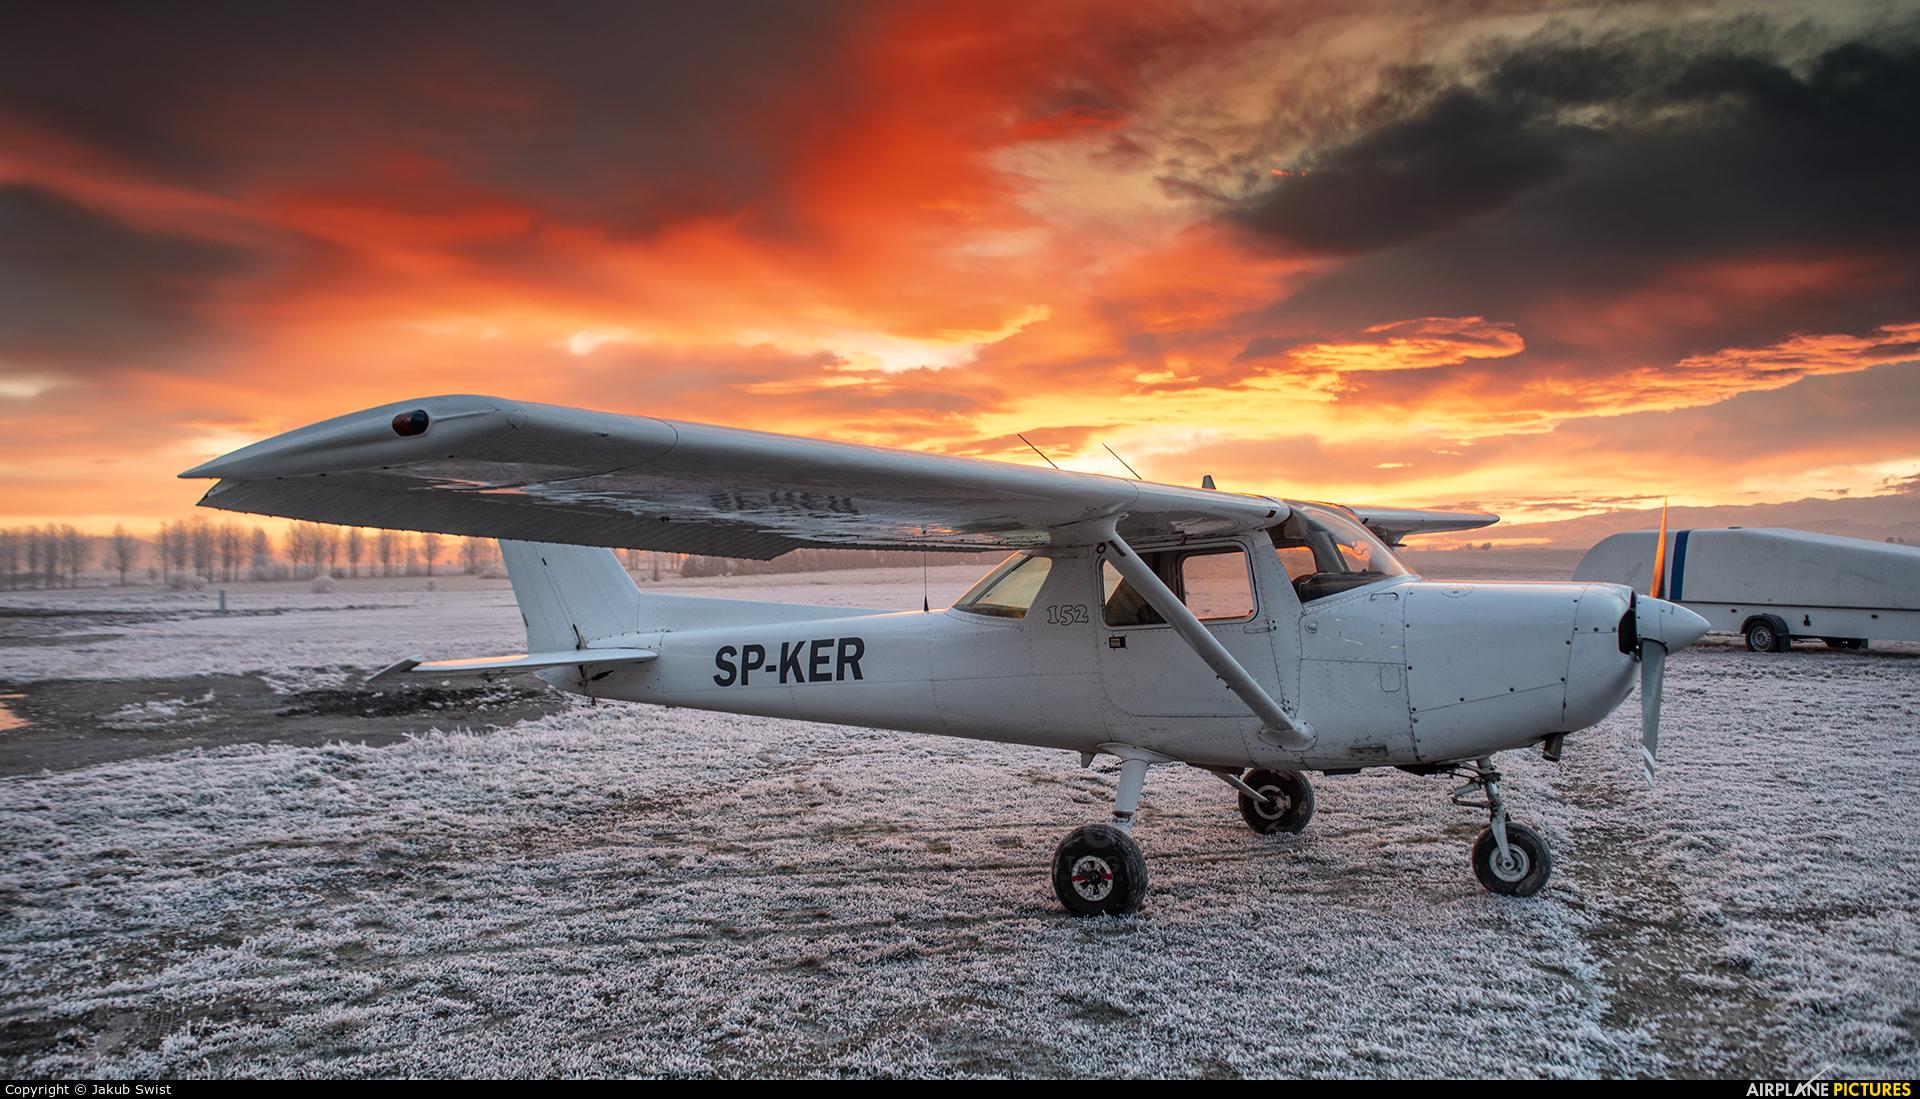 Aeroklub Nowy Targ SP-KER aircraft at Nowy Targ Airport